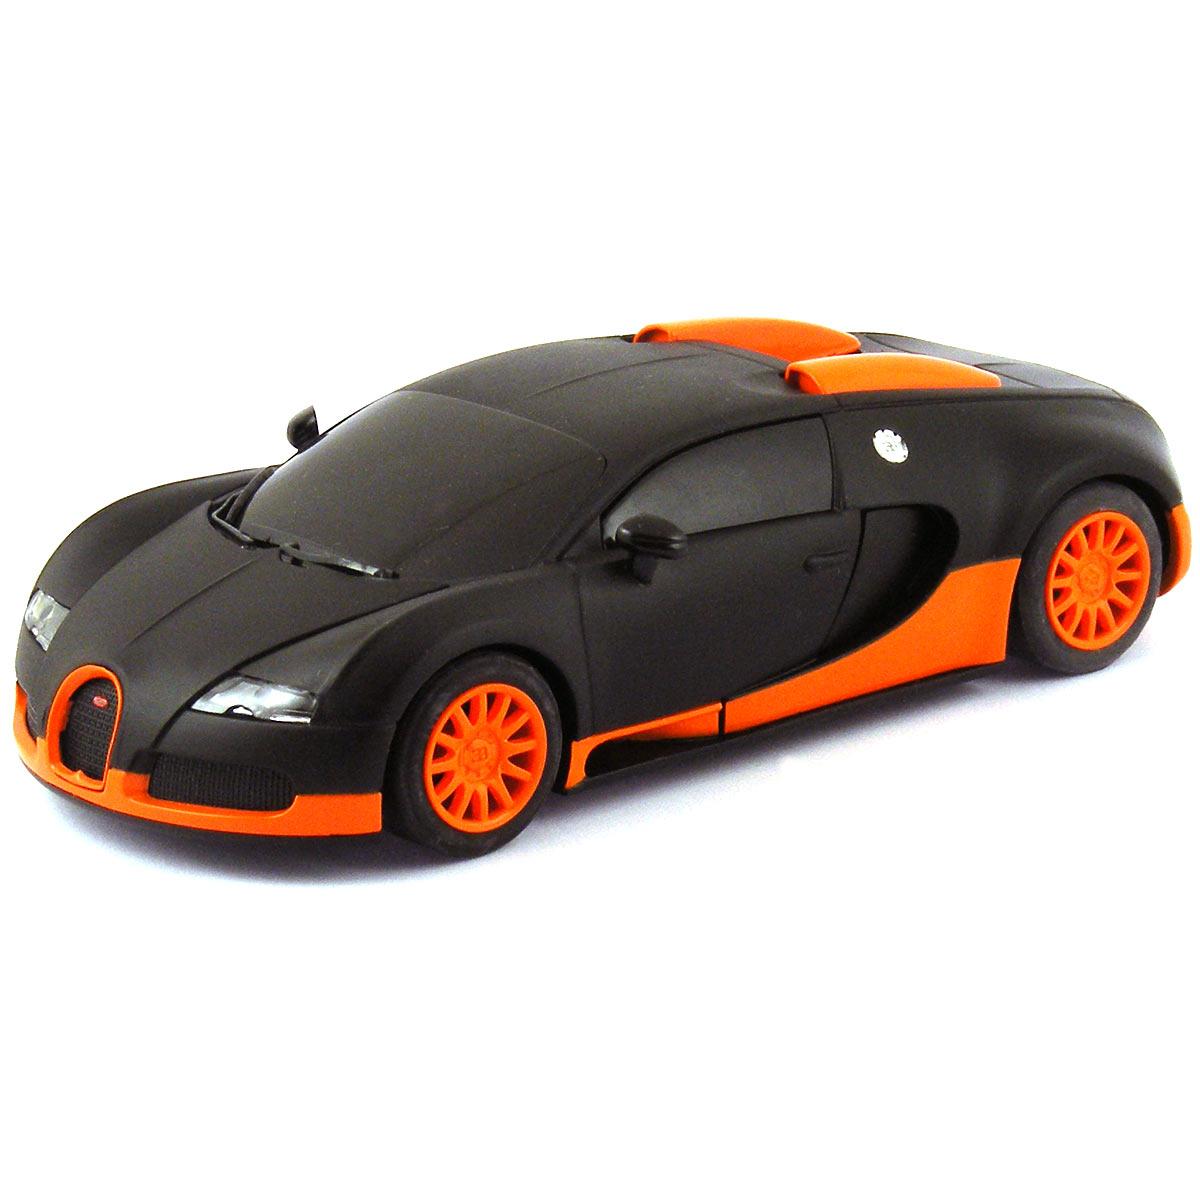 scalextric bugatti veyron matt black orange c3661. Black Bedroom Furniture Sets. Home Design Ideas